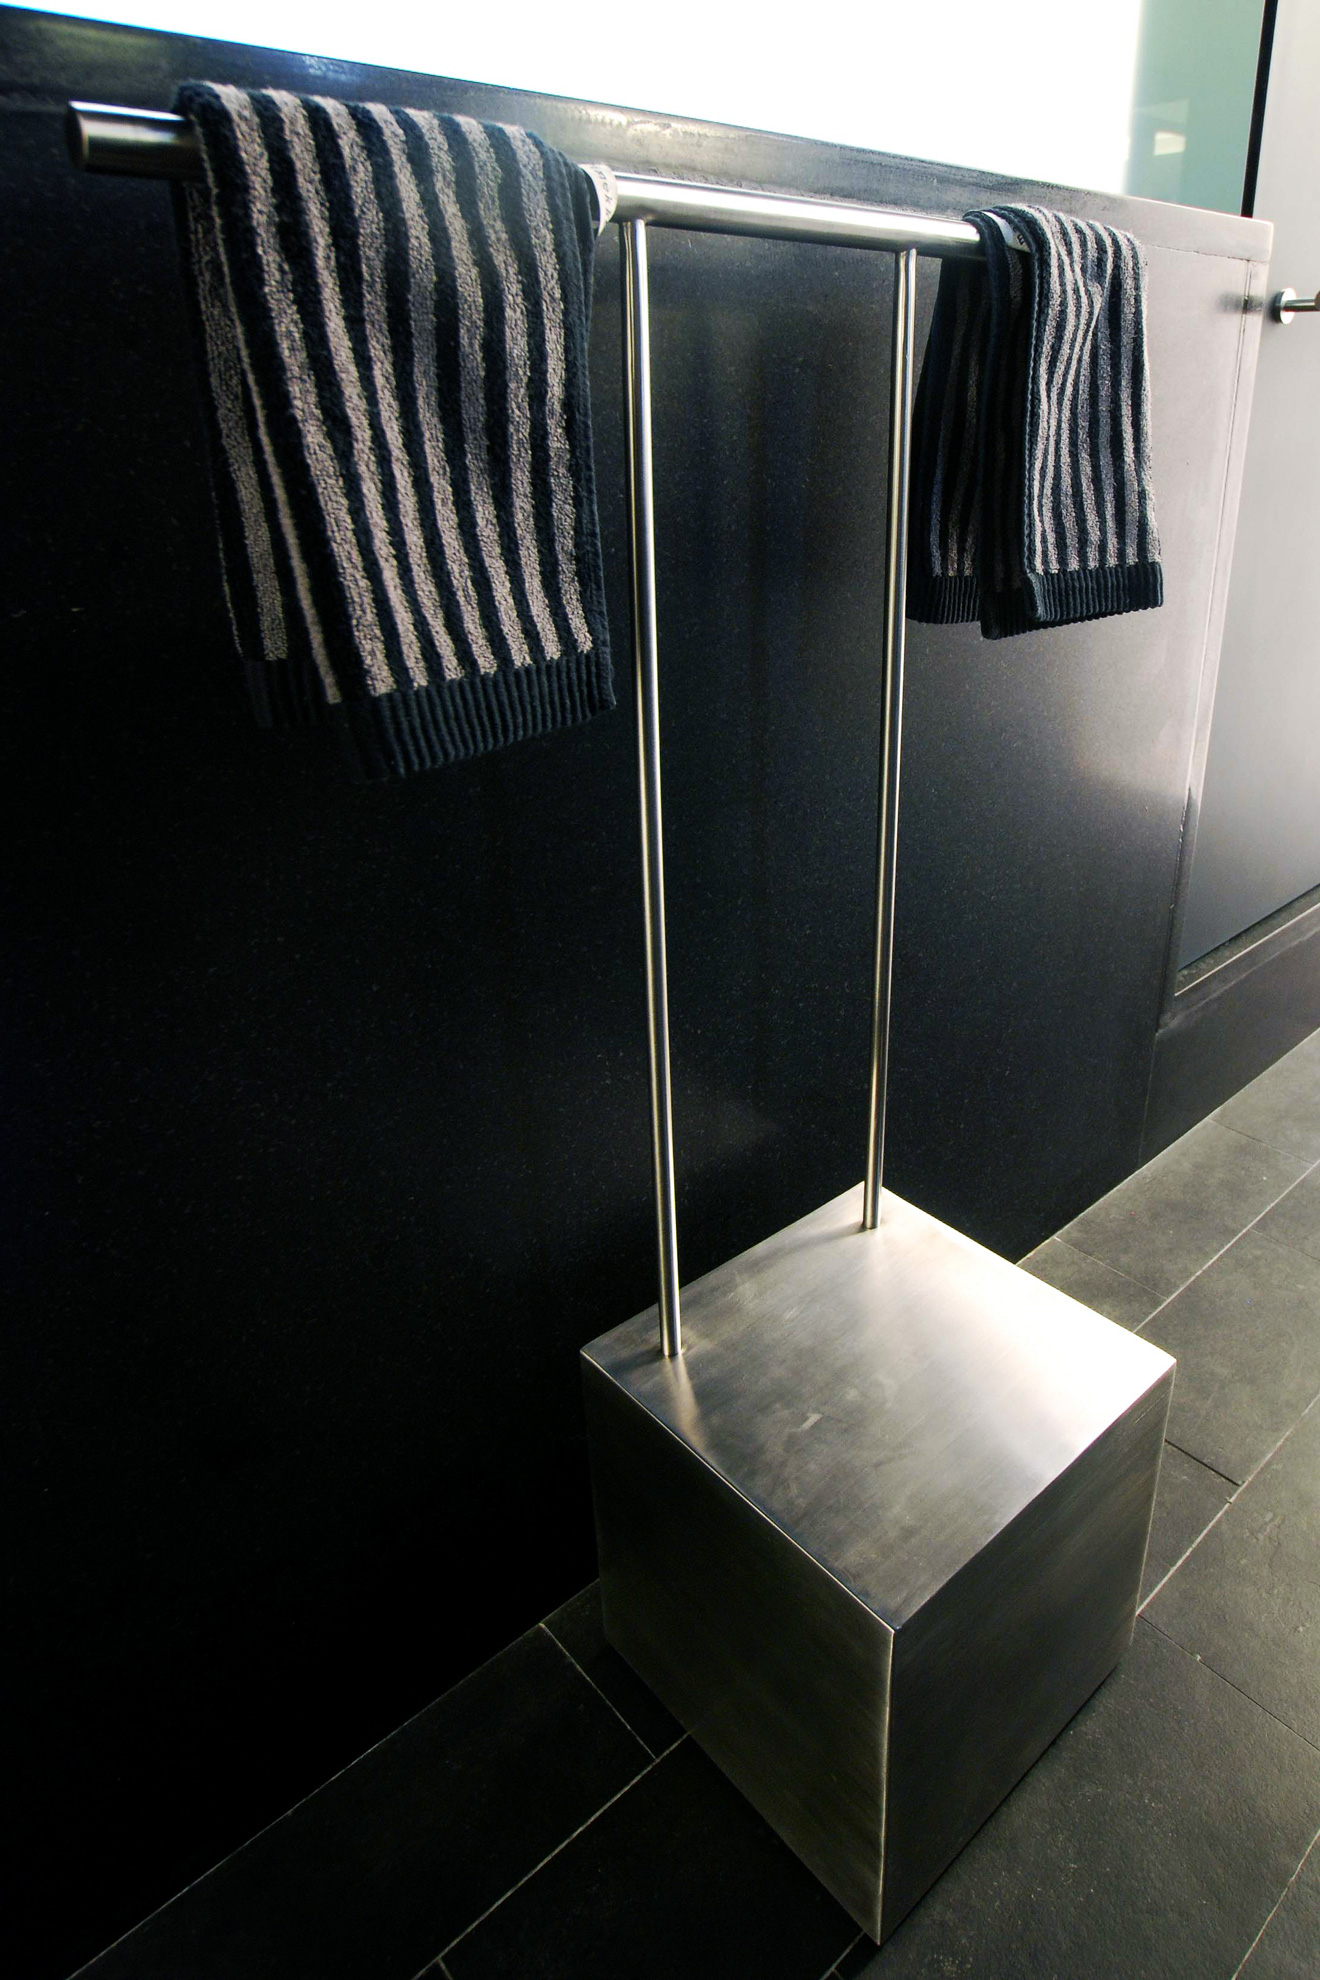 Portable Towel Bar